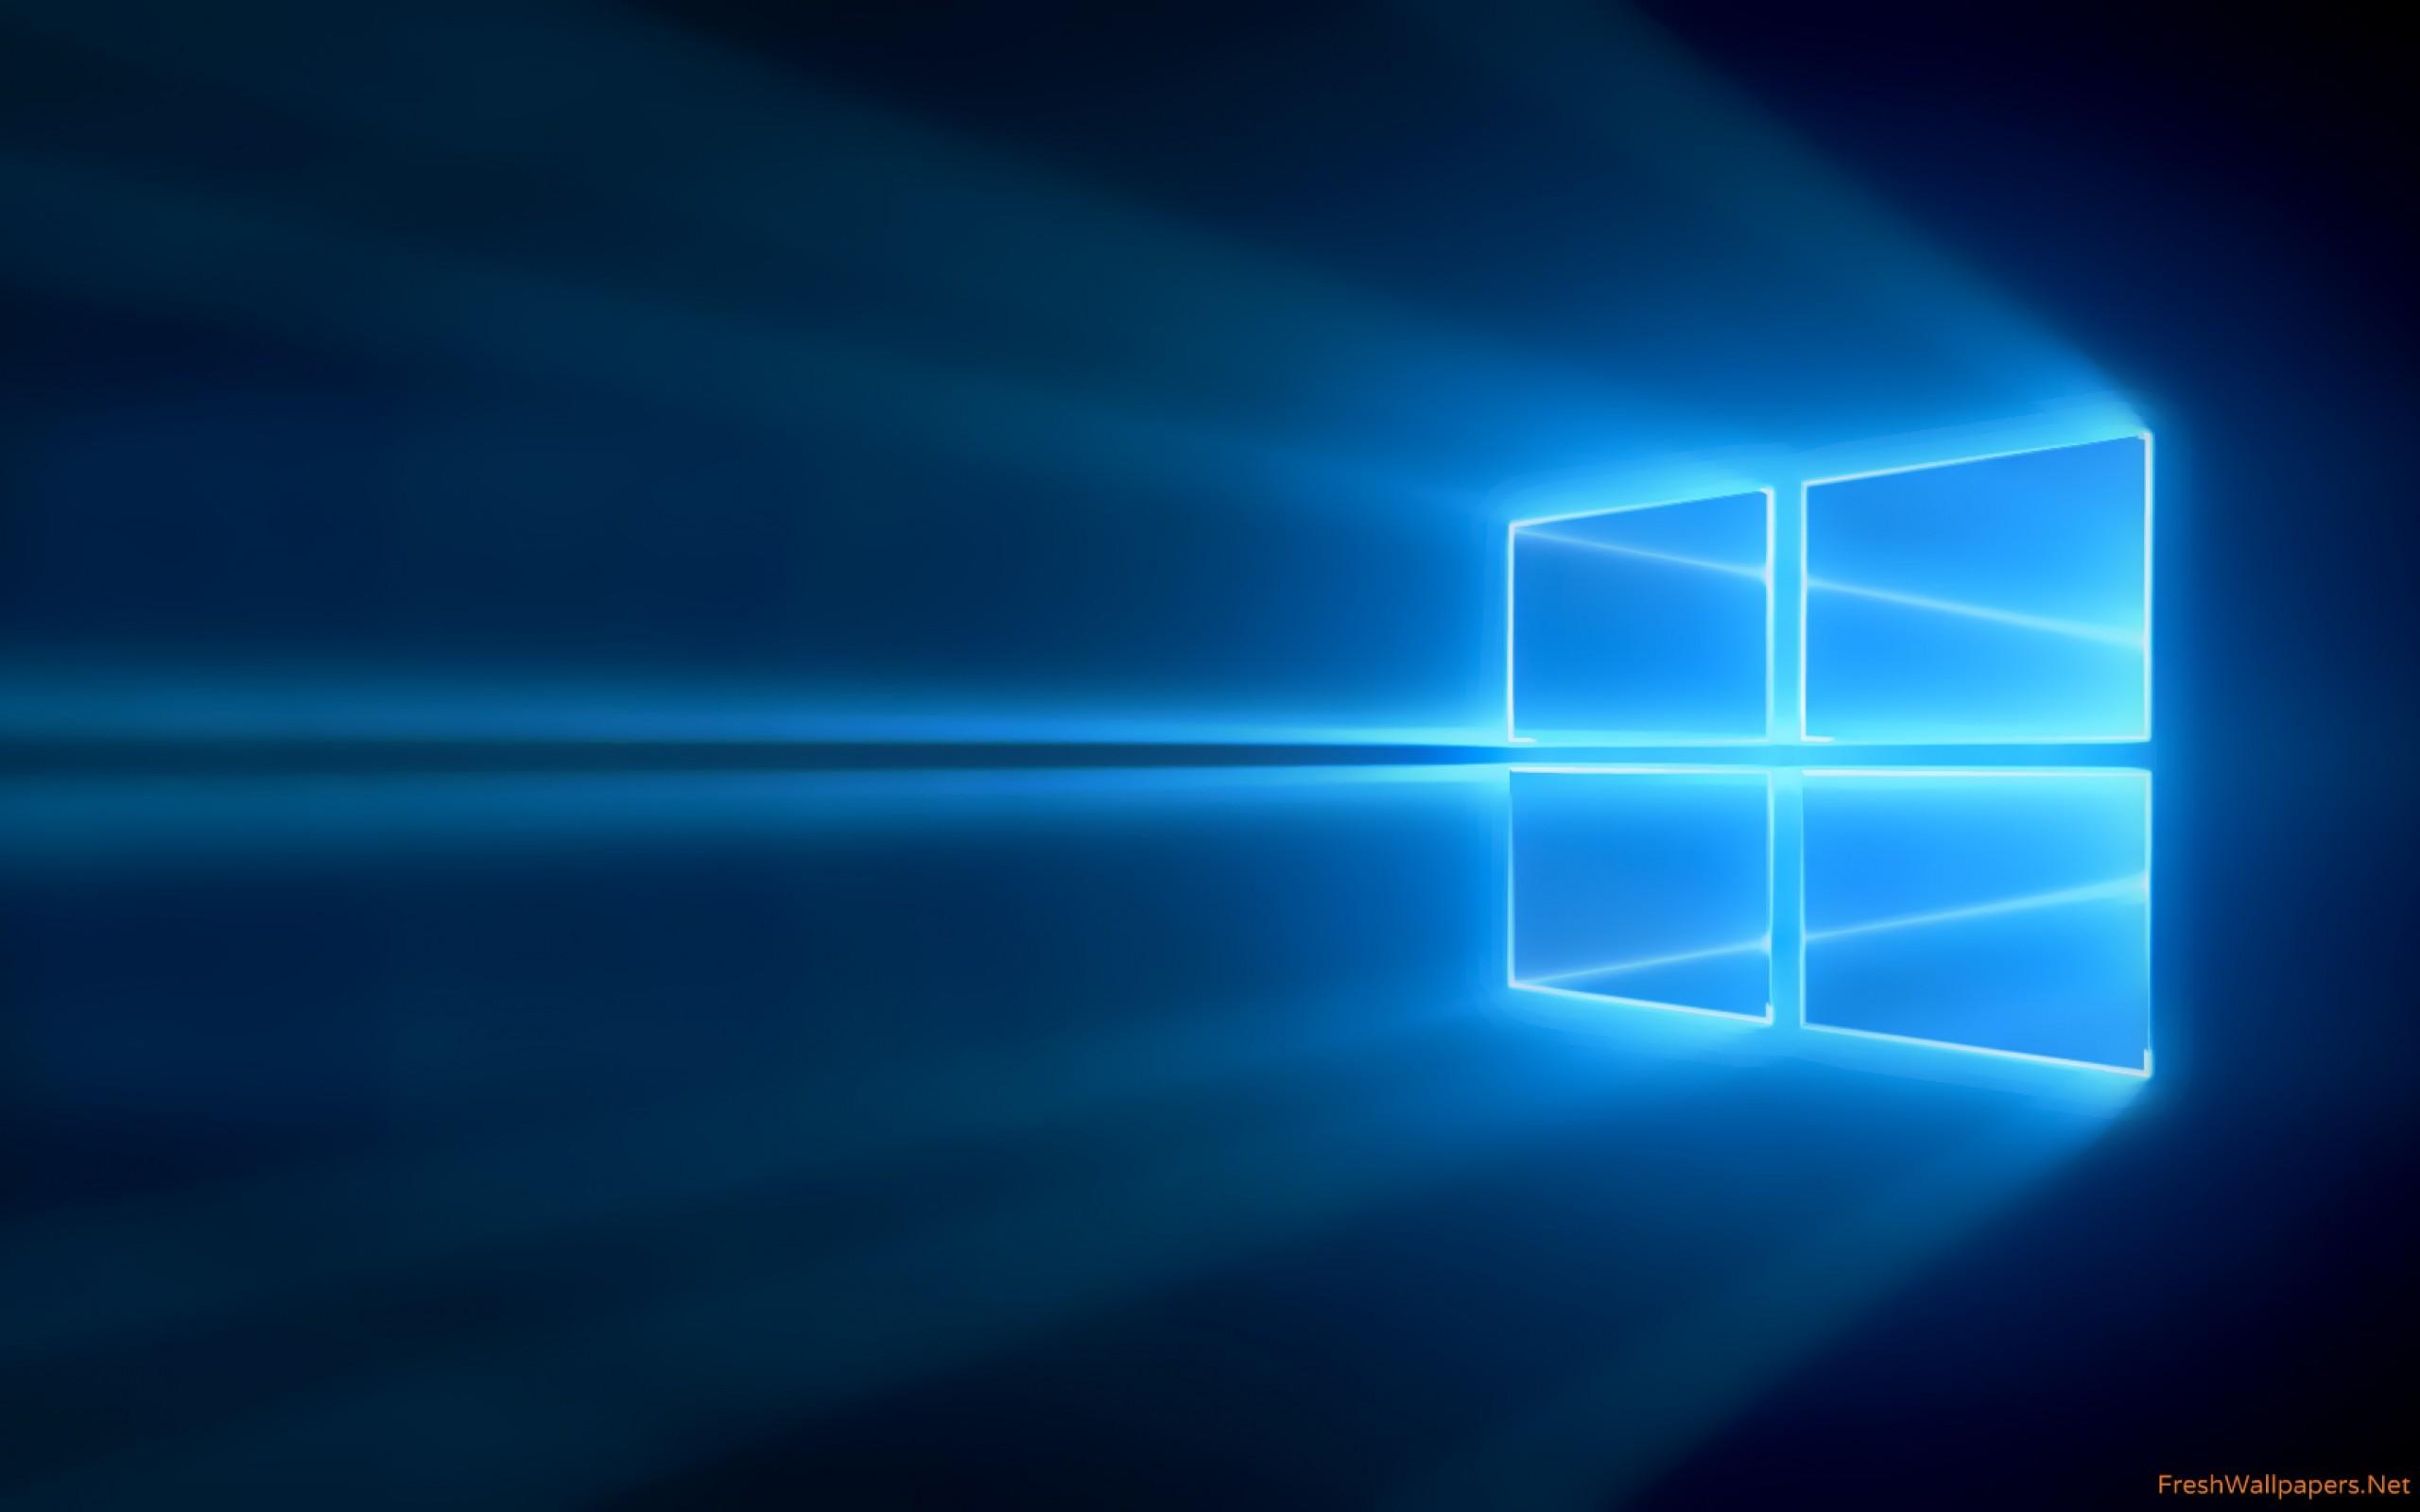 Windows 10 desktop wallpaper full hd